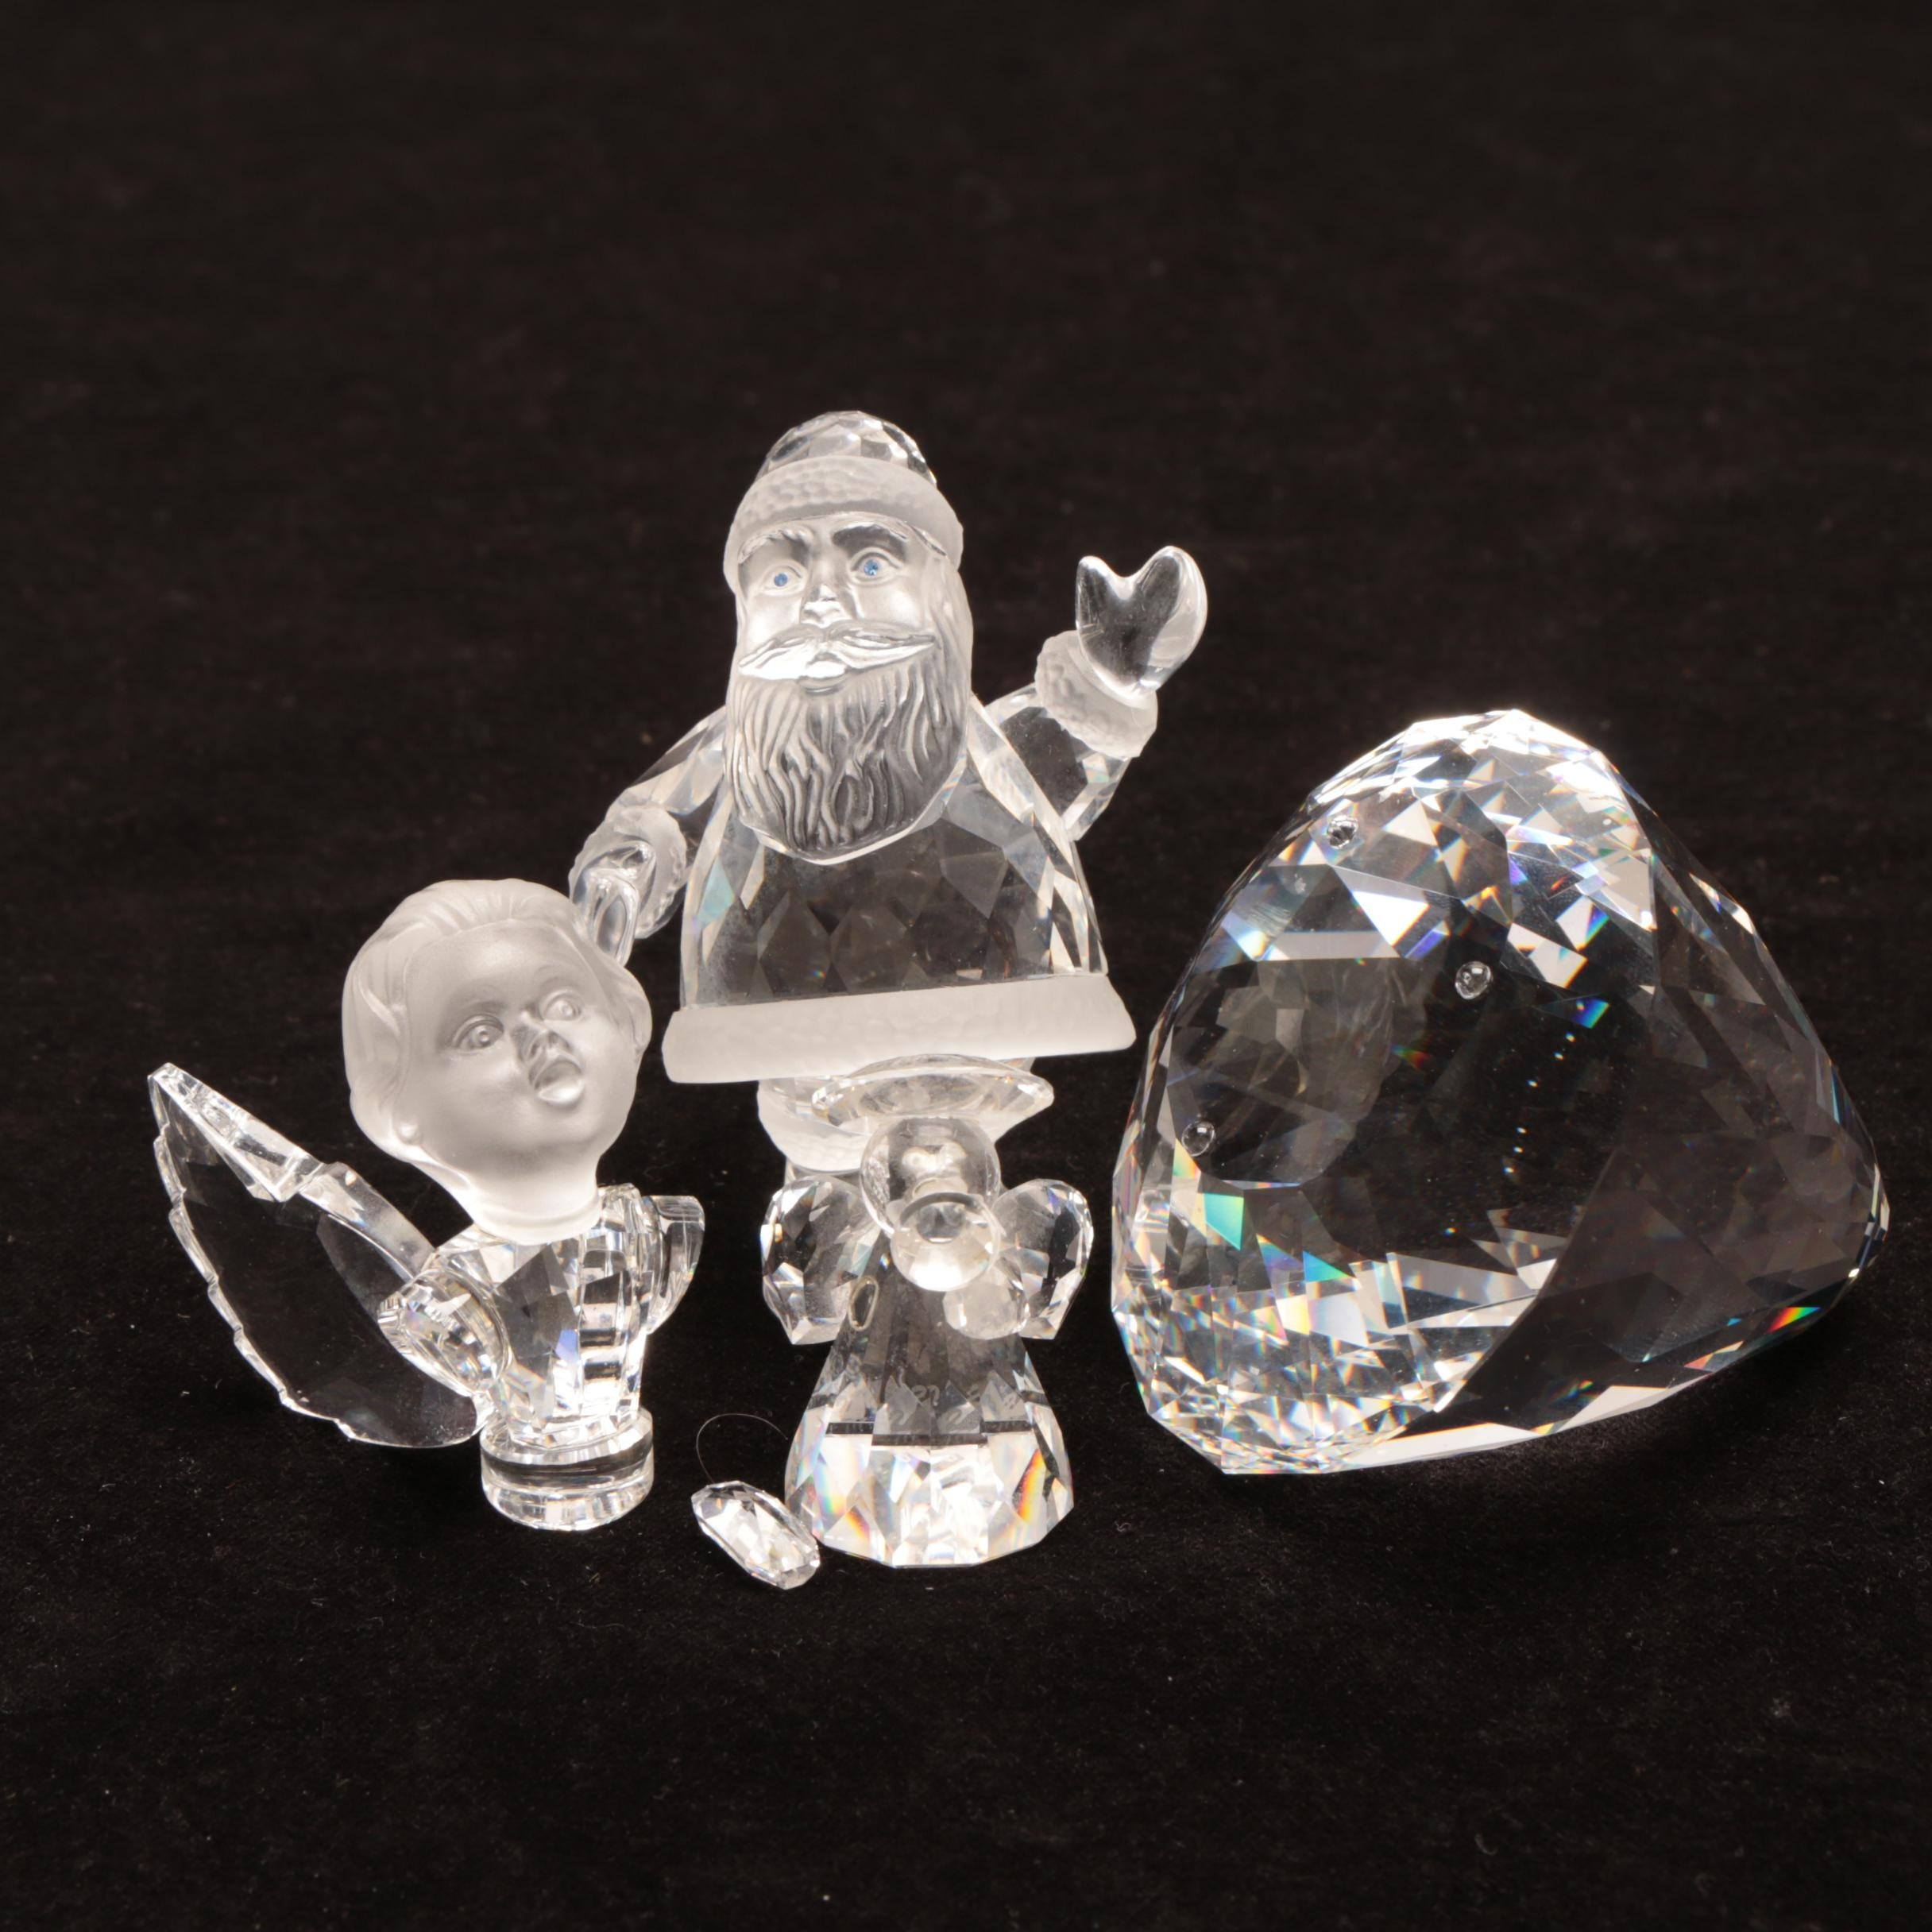 Swarovski Crystal Holiday Figurines